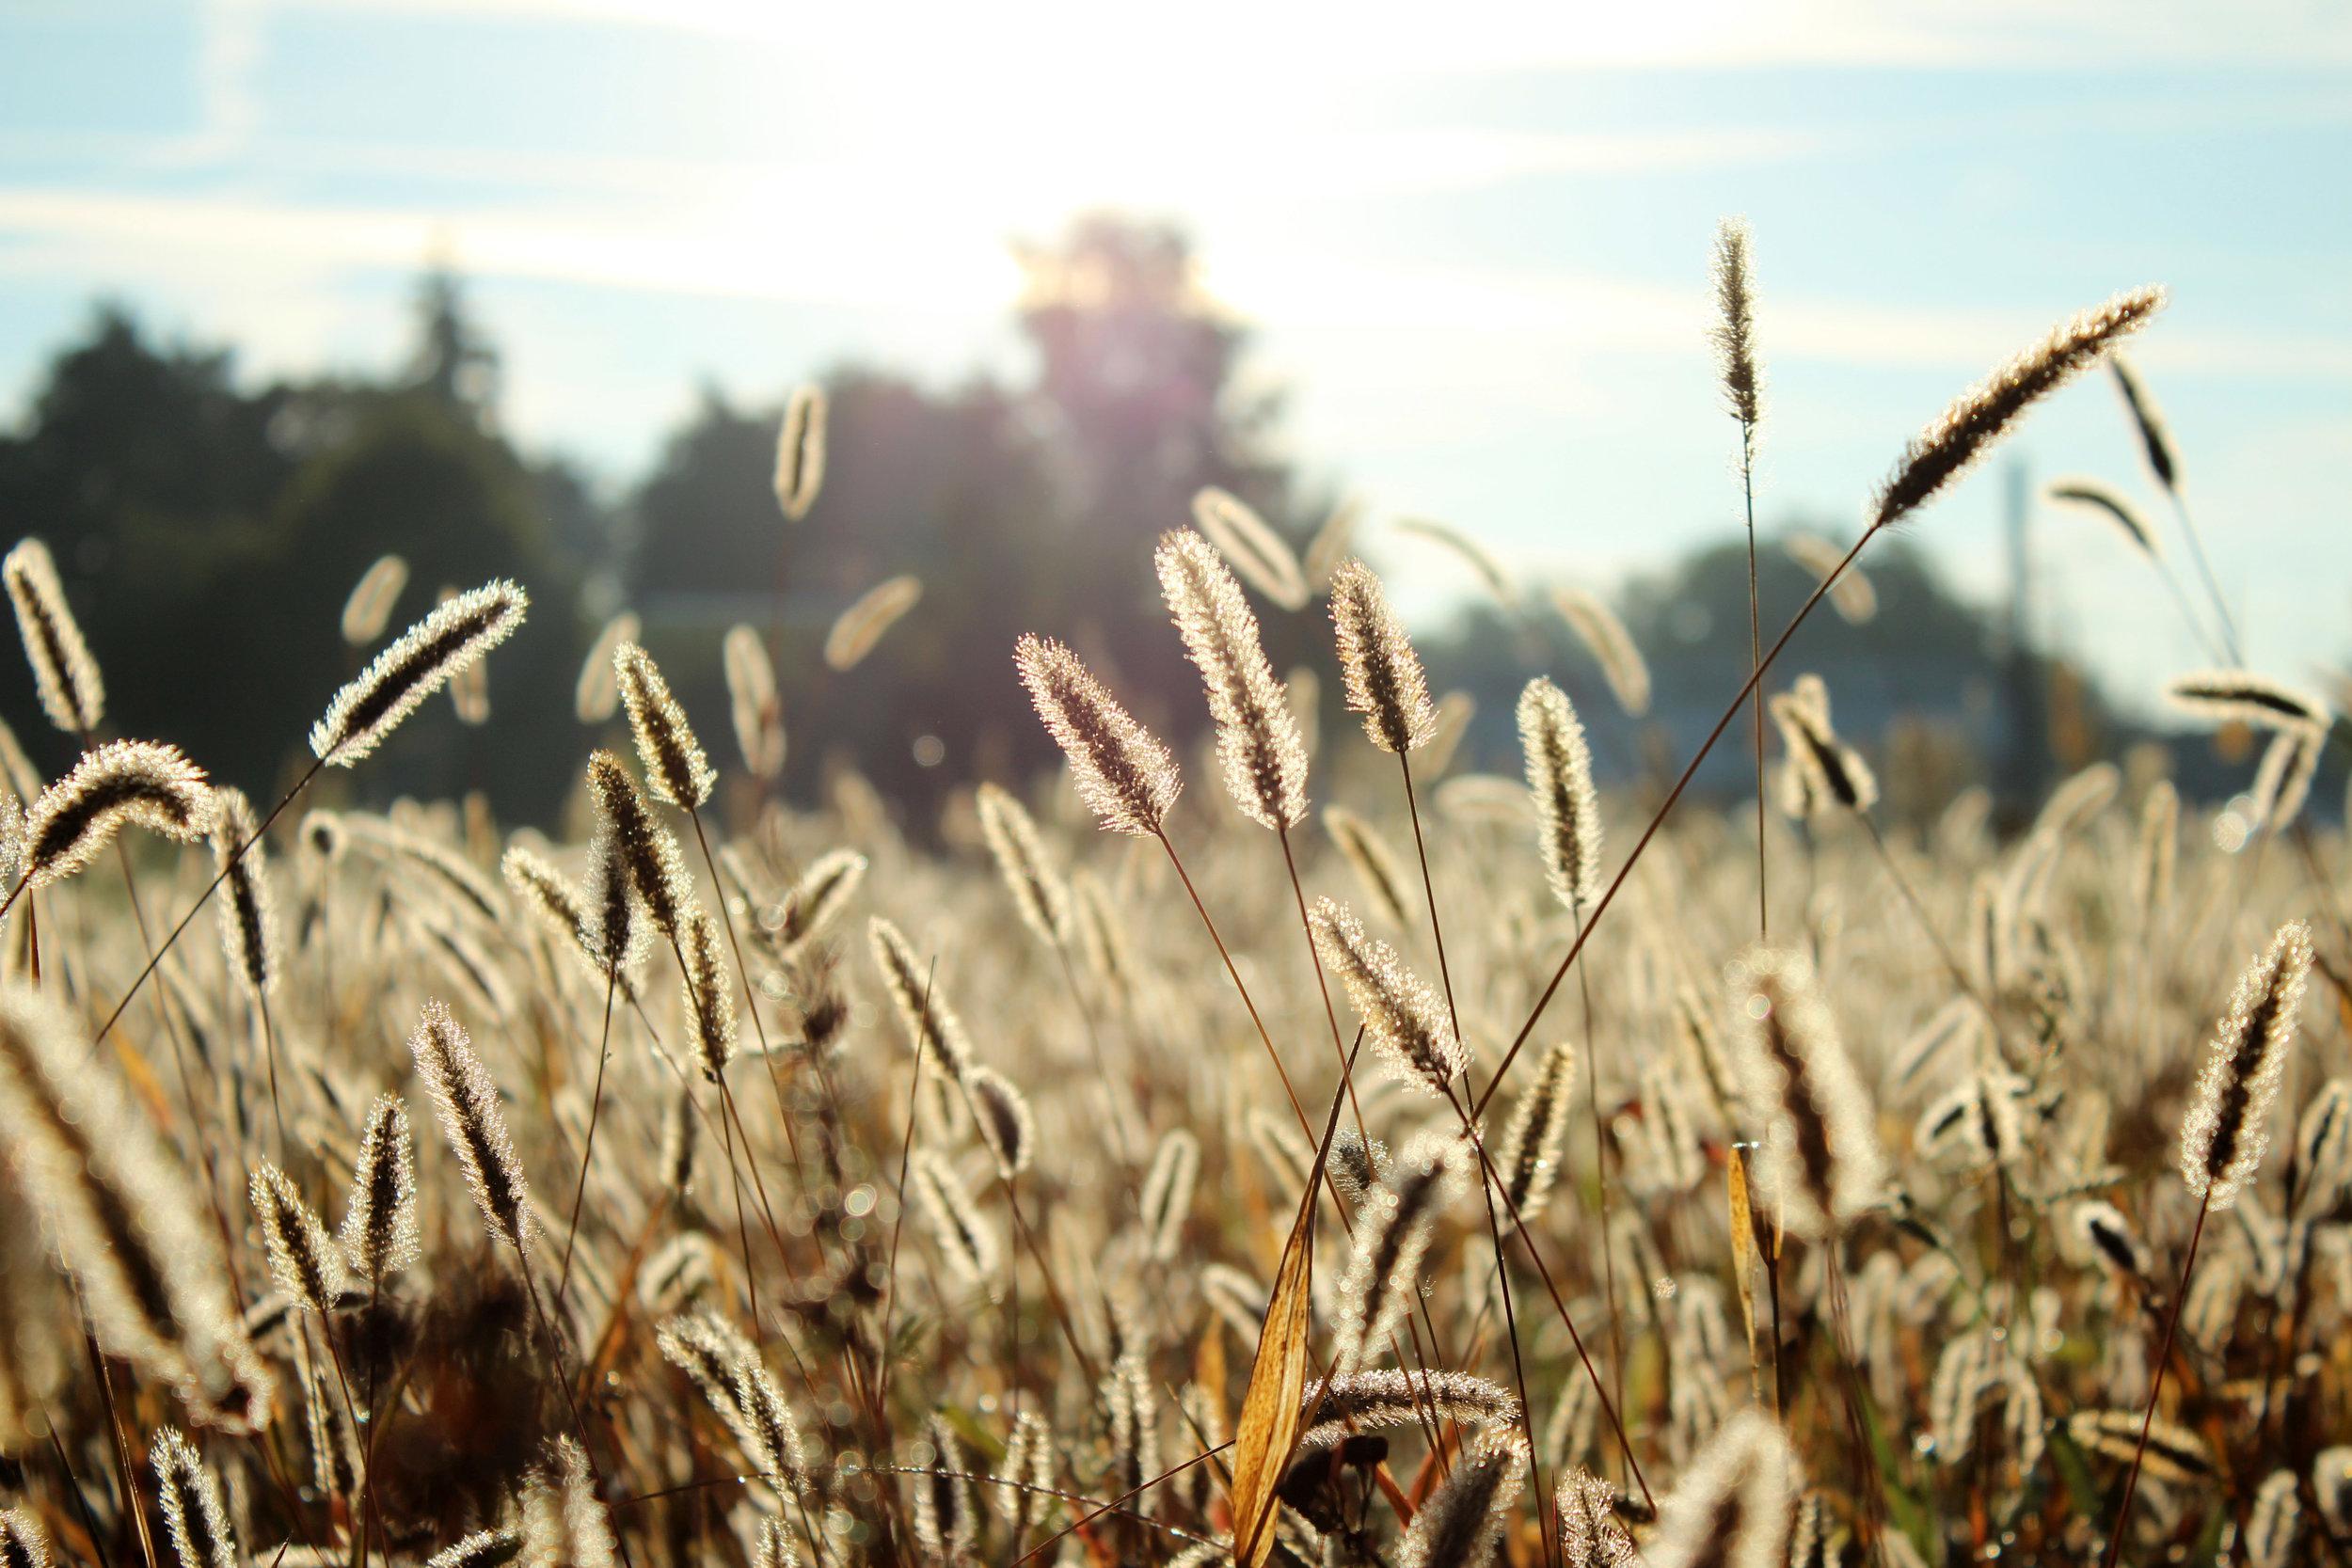 wheats-stalks-growing.jpg